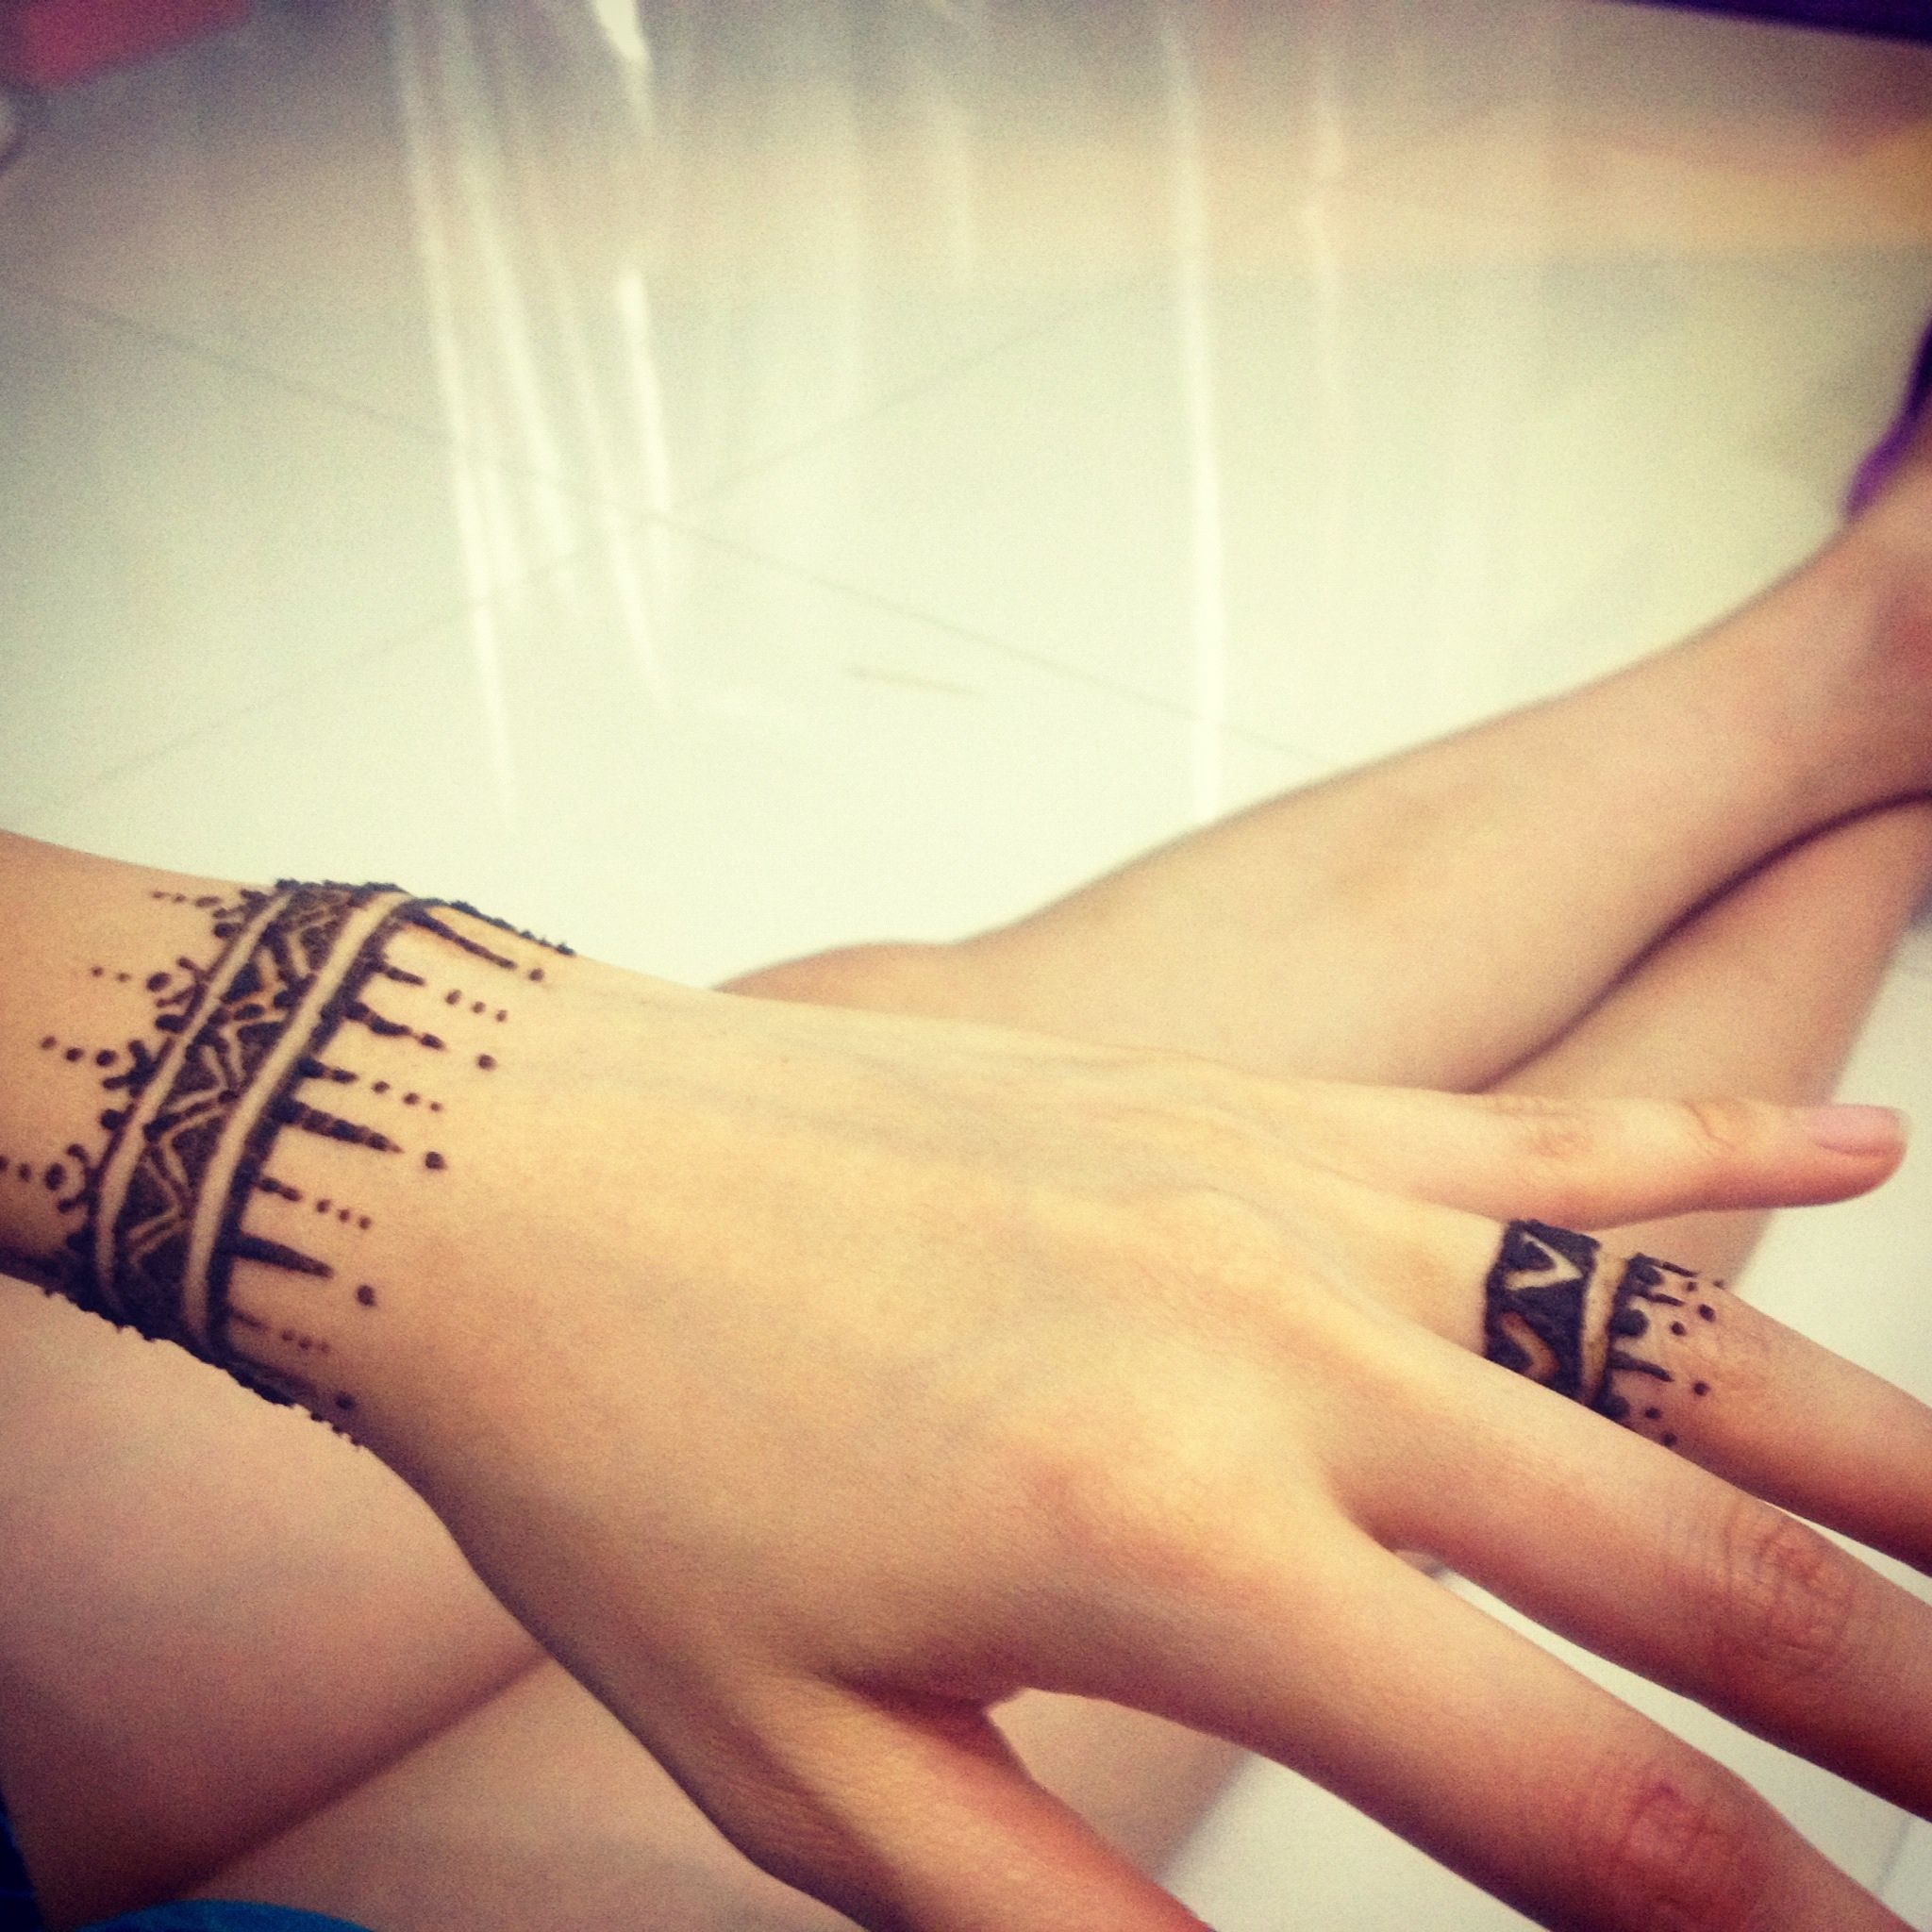 40 Unique Arm Band Tattoo Designs Hand Henna Henna Designs Easy Henna Tattoo Designs